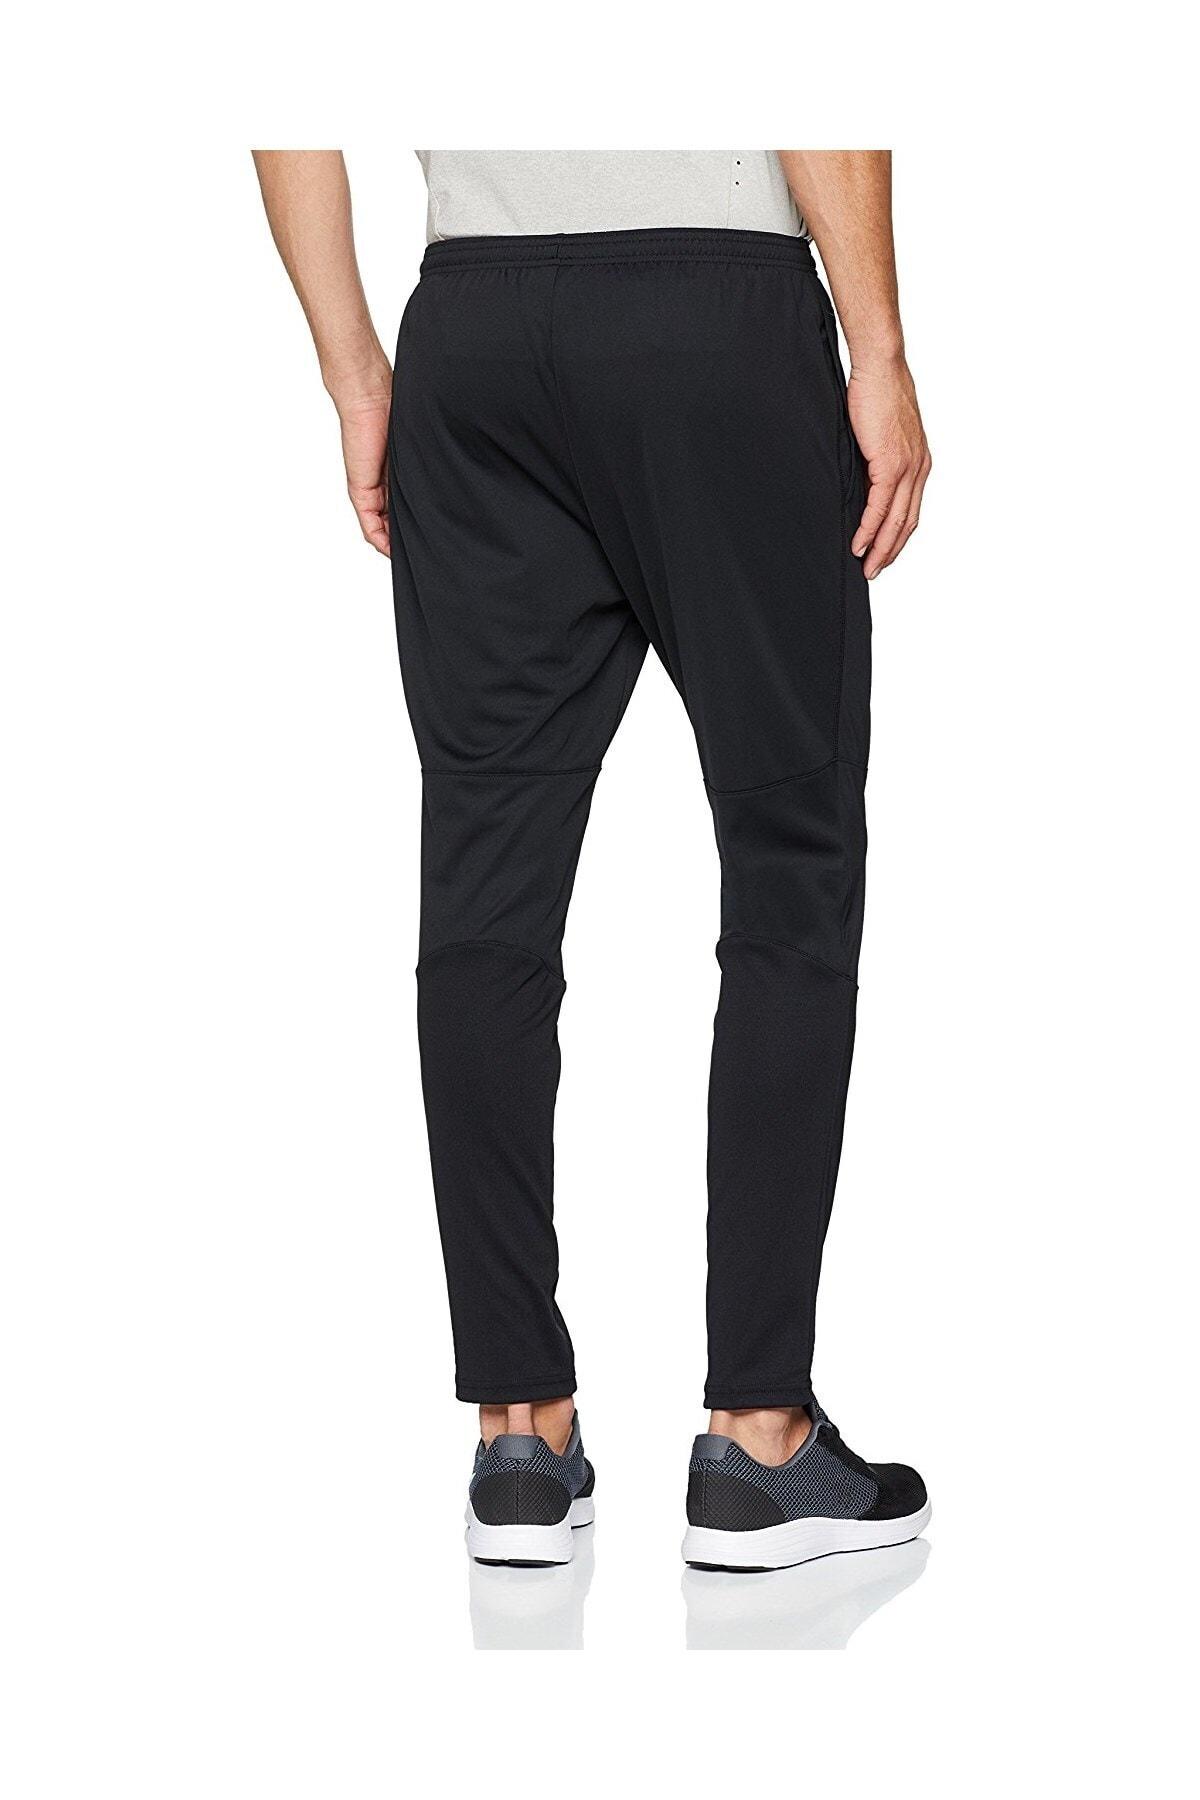 Nike Erkek Siyah Eşofman Altı Aa2086-010 2